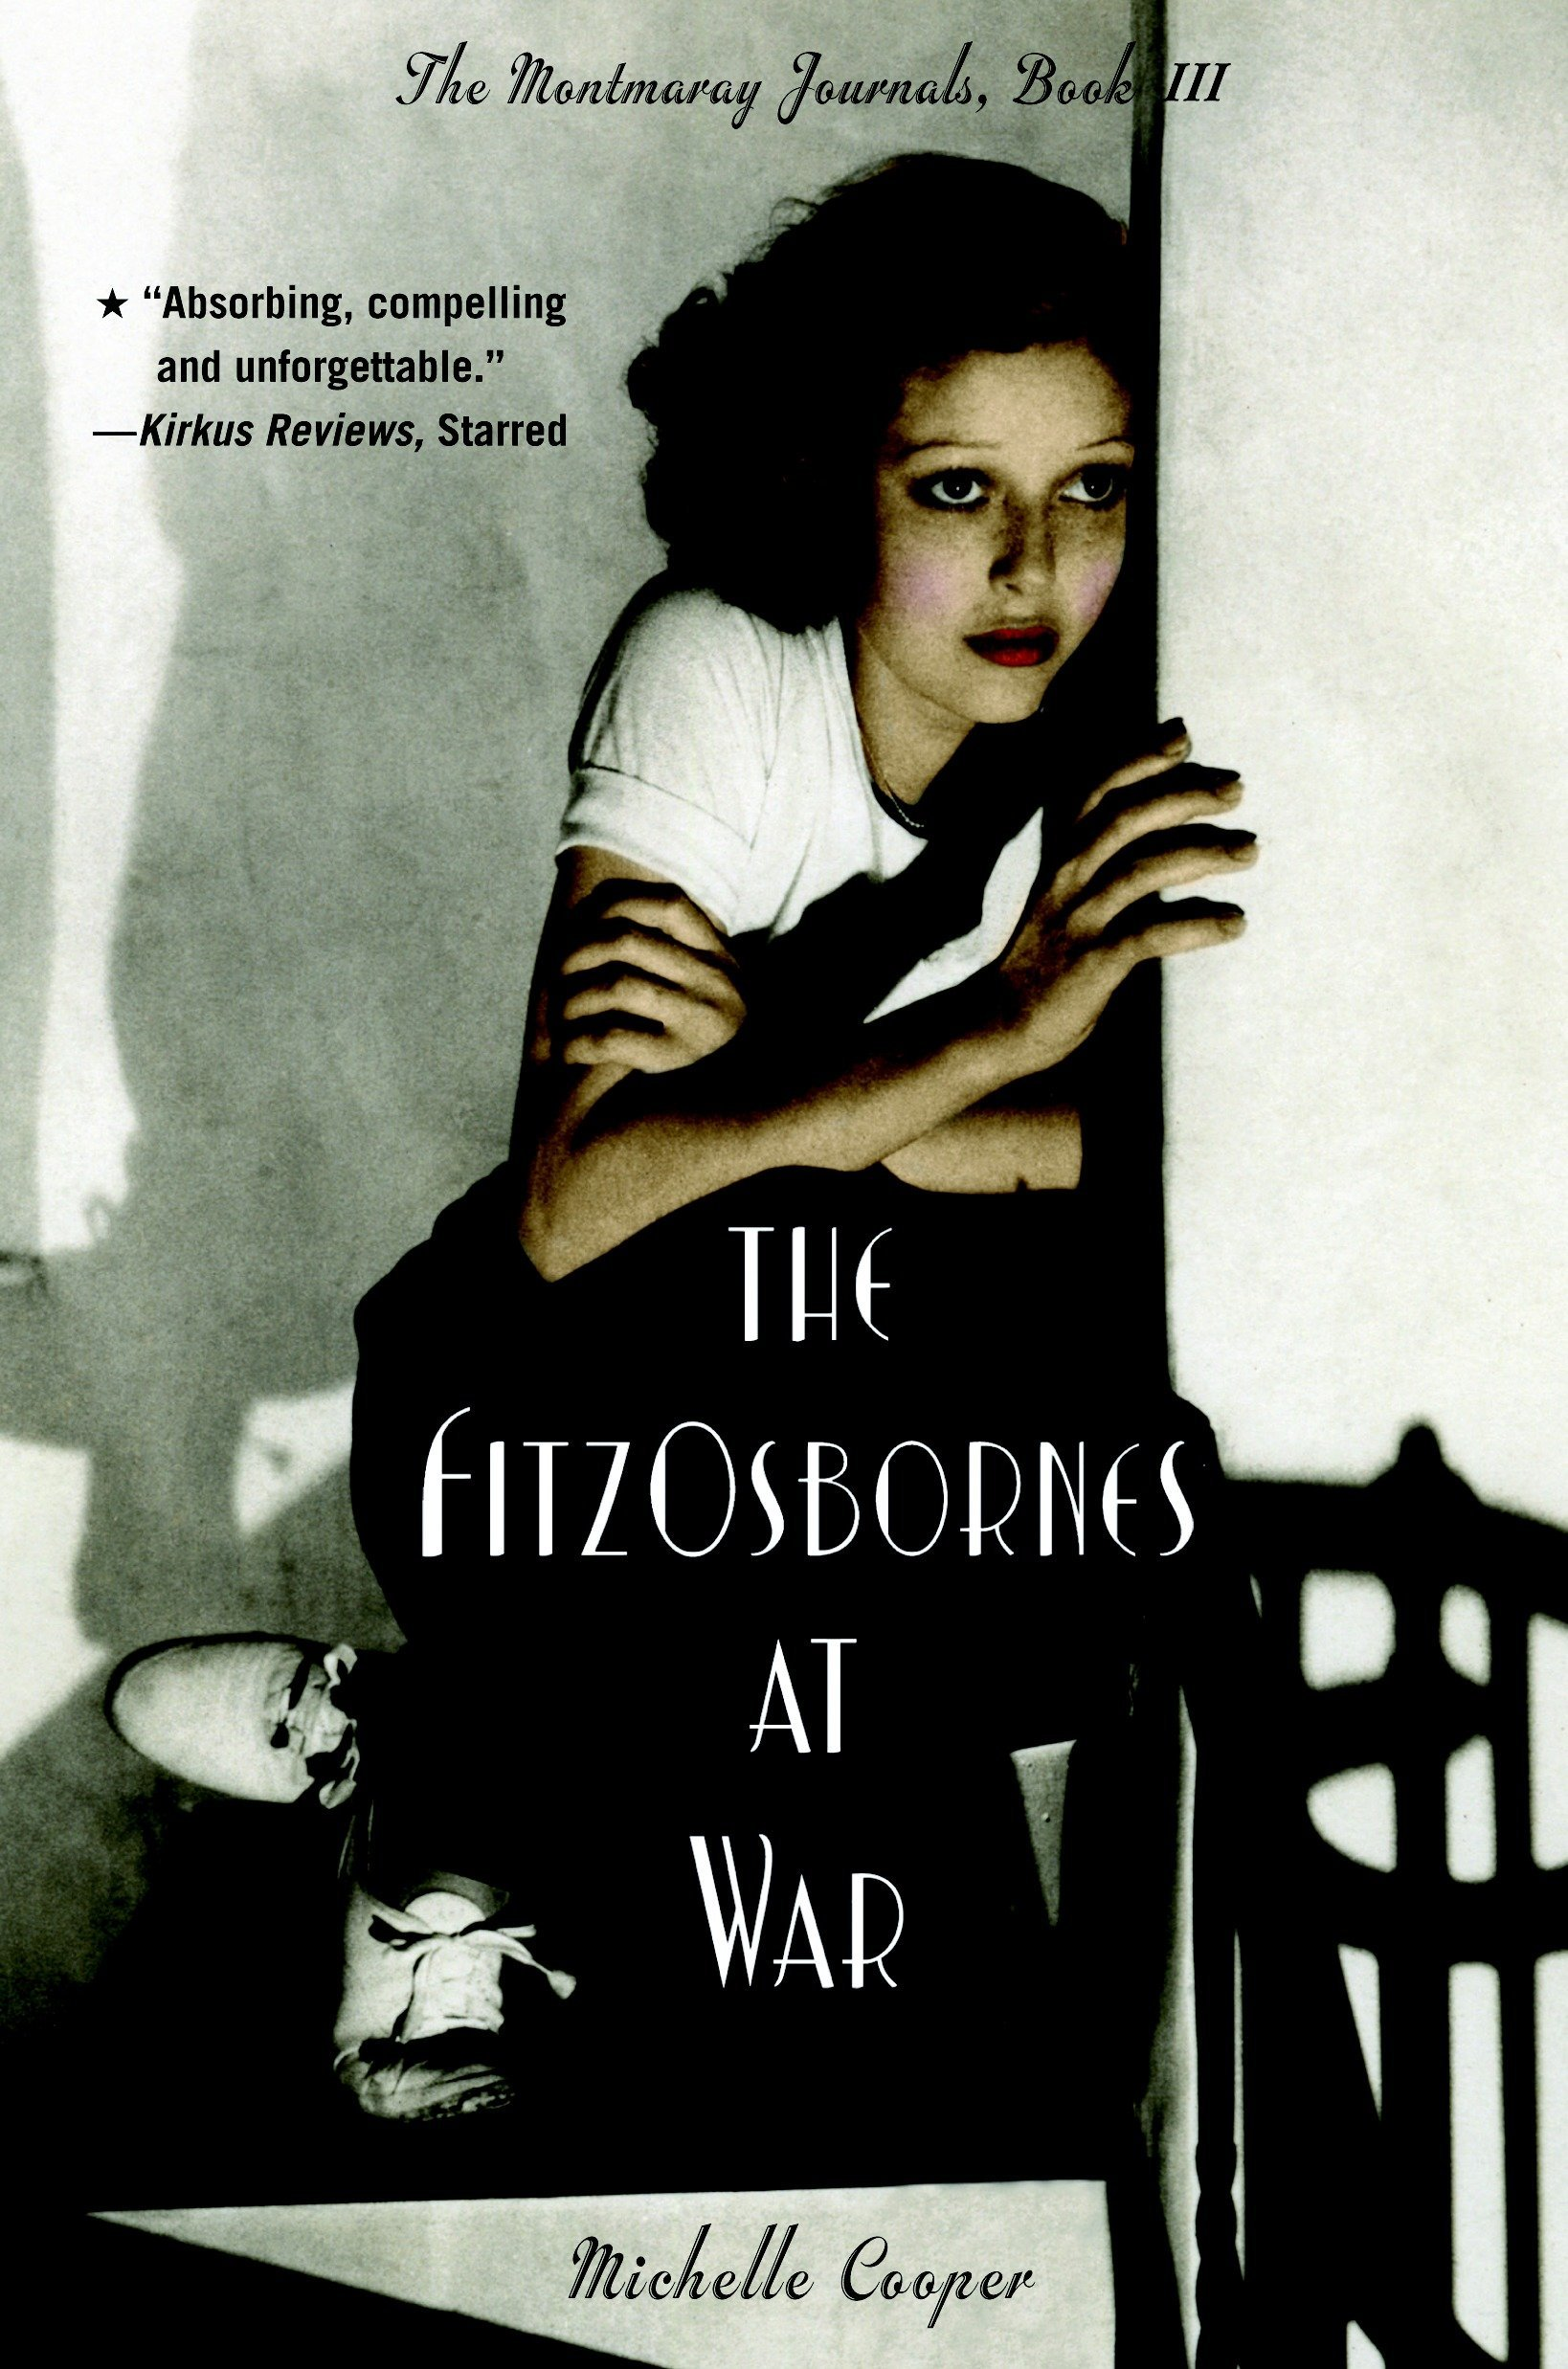 Download The FitzOsbornes at War (The Montmaray Journals) pdf